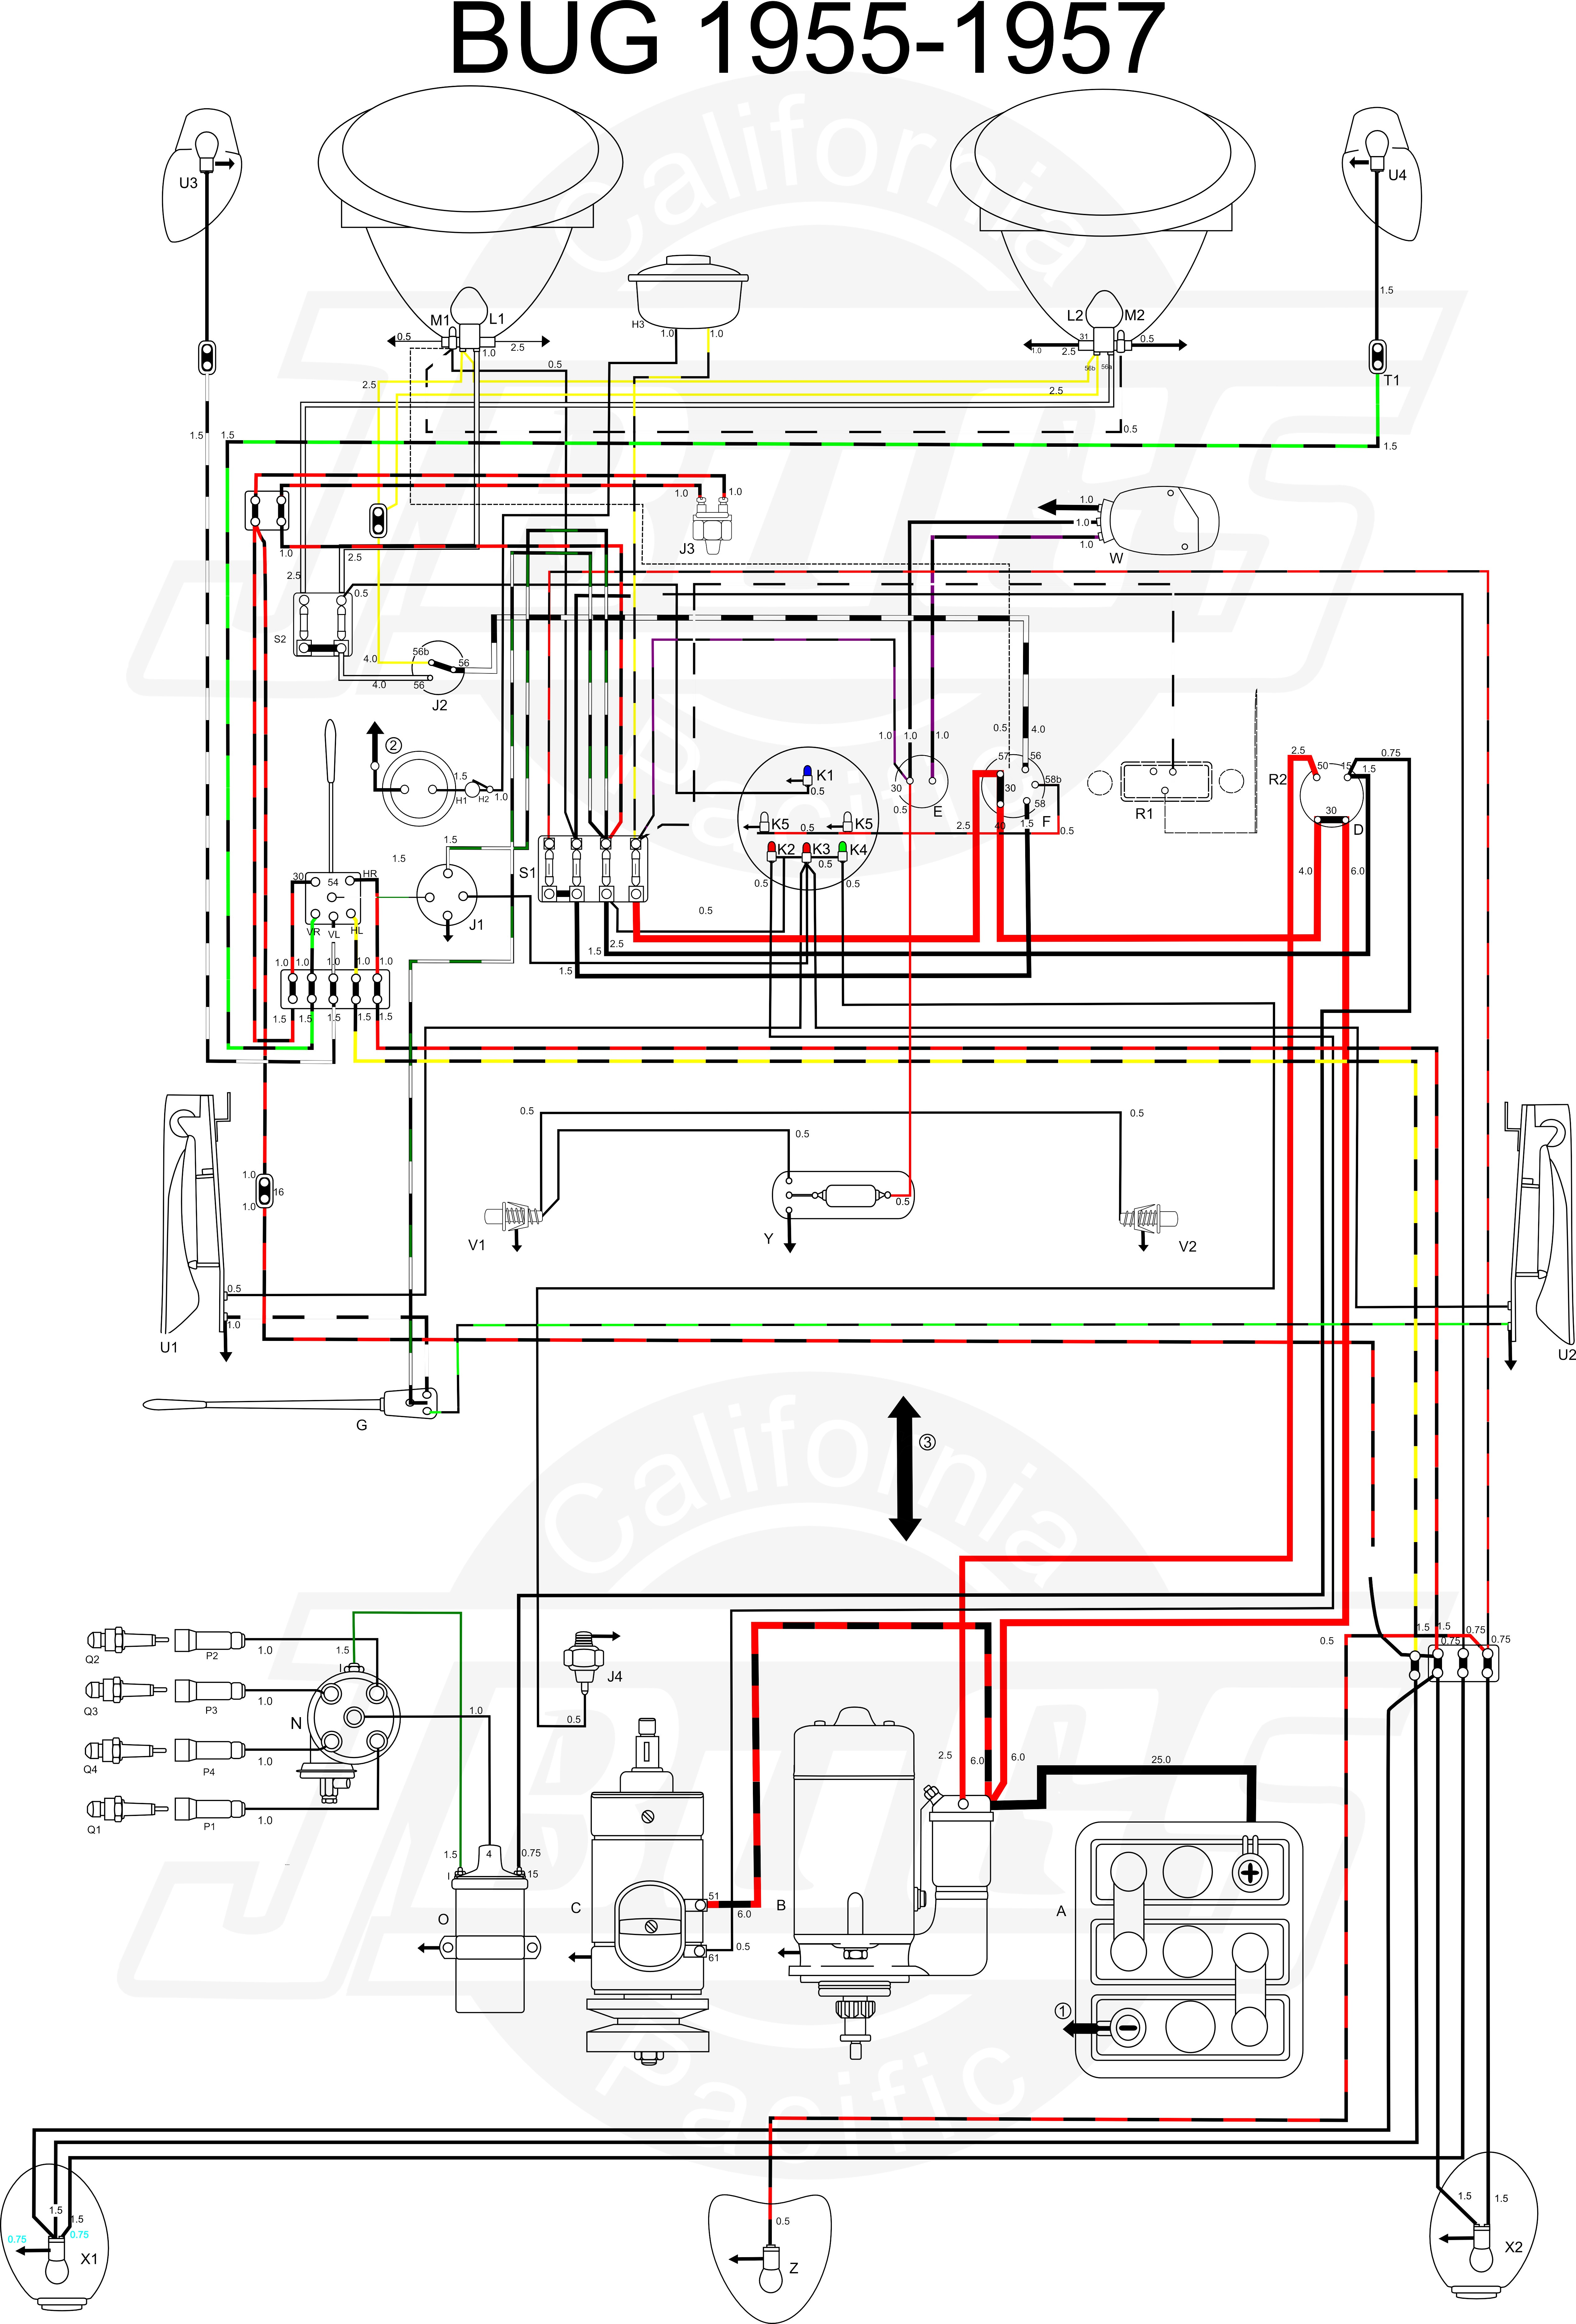 1970 vw beetle turn signal wiring diagram